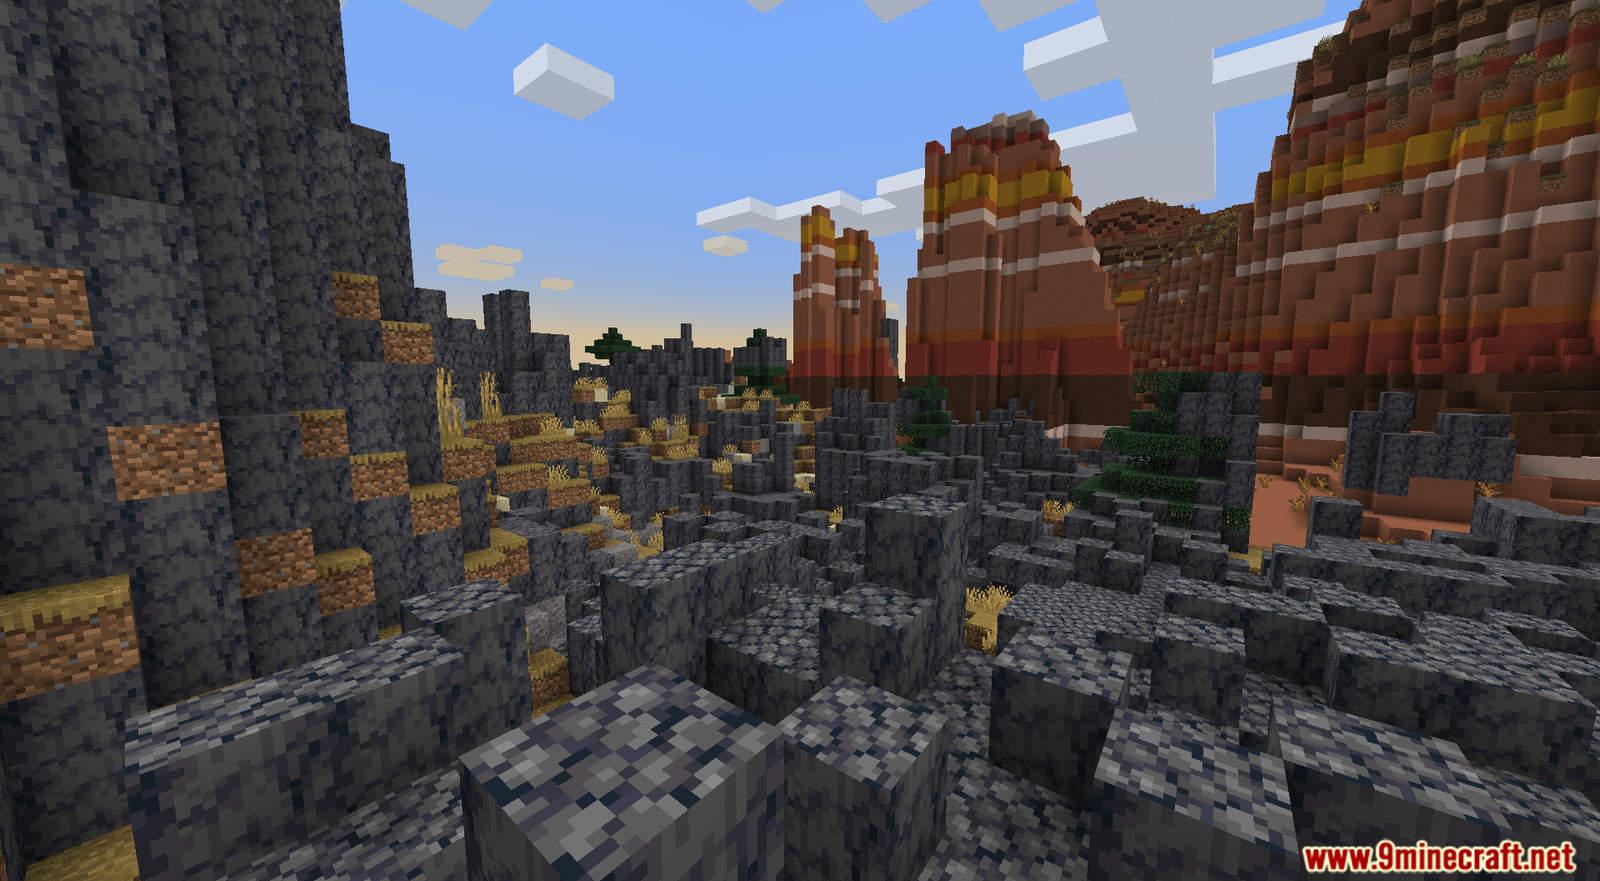 William Wythers' Overhauled Overworld Mod for Minecraft (4)